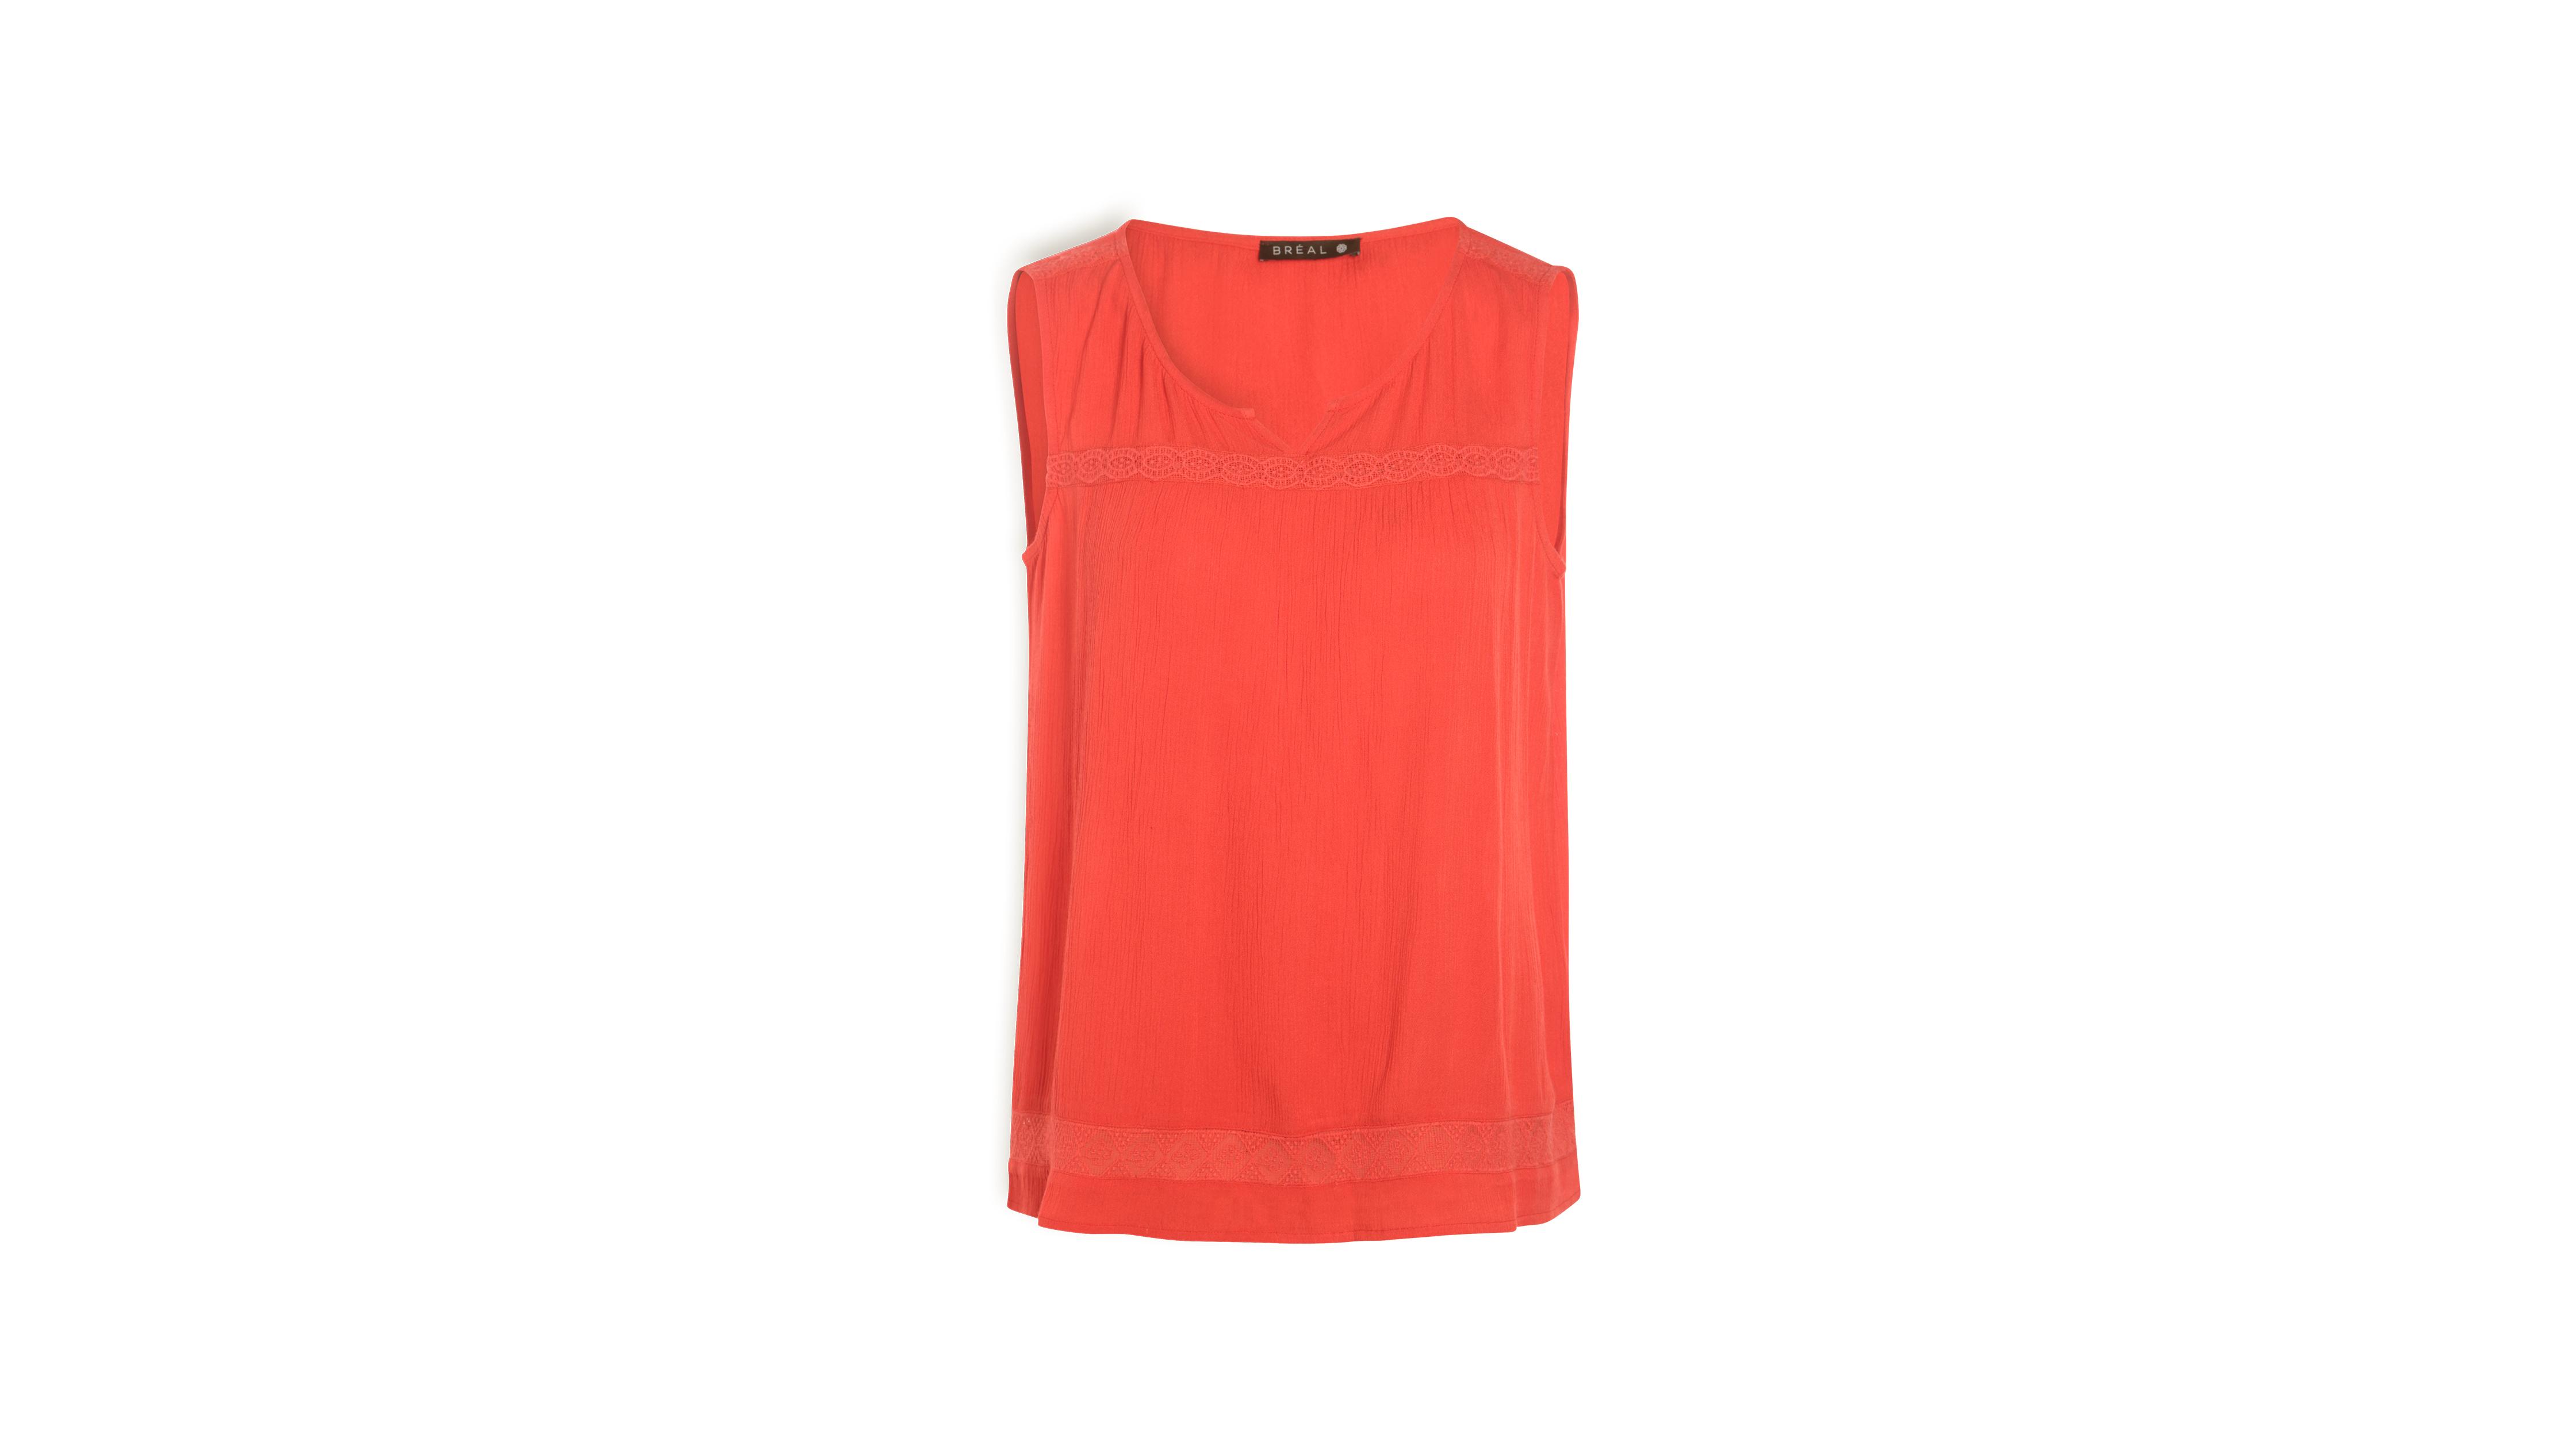 Camisa mangas sin para mangas Macramé sin fucsia mujer rosa nwPNZ80OkX